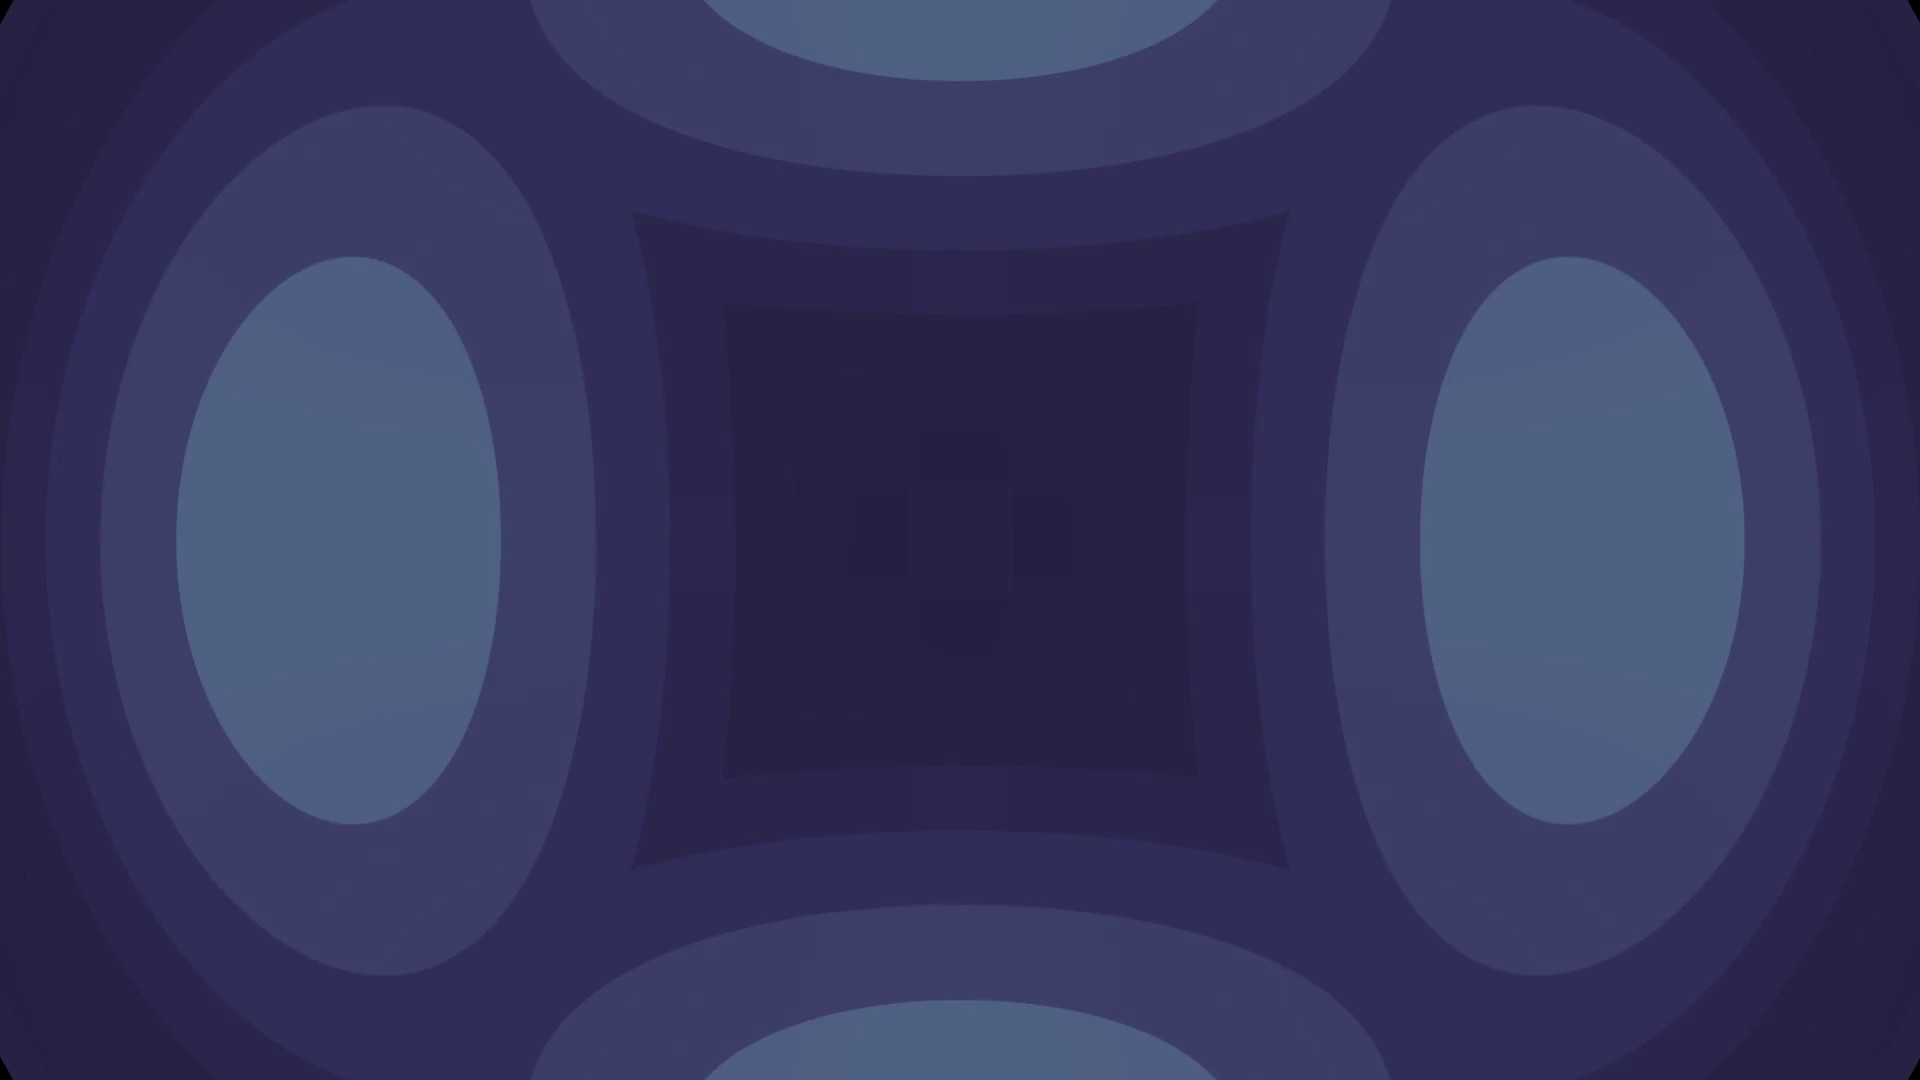 1920x1080, Abstract Shiny Soft Color Moving Vertical - Circle - HD Wallpaper